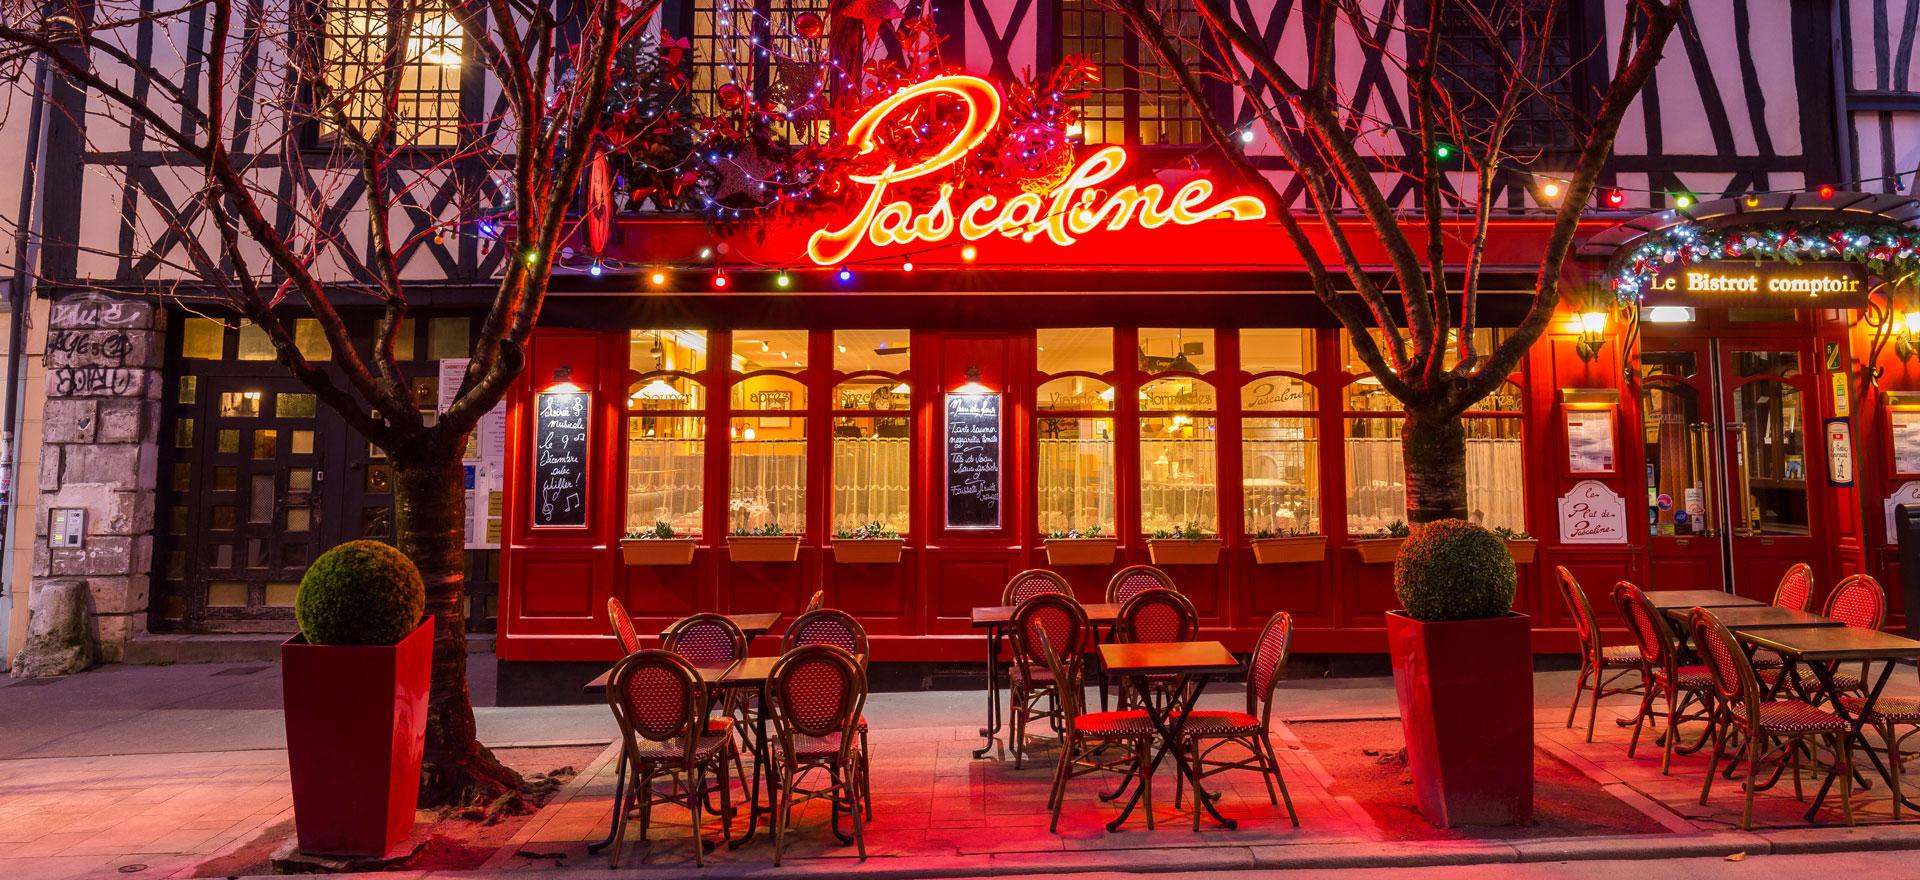 restaurant-pascaline-bistrot-comptoir-buffet-volonte-fait-maison-gueret-1880-rouen-1-facade-1920x880